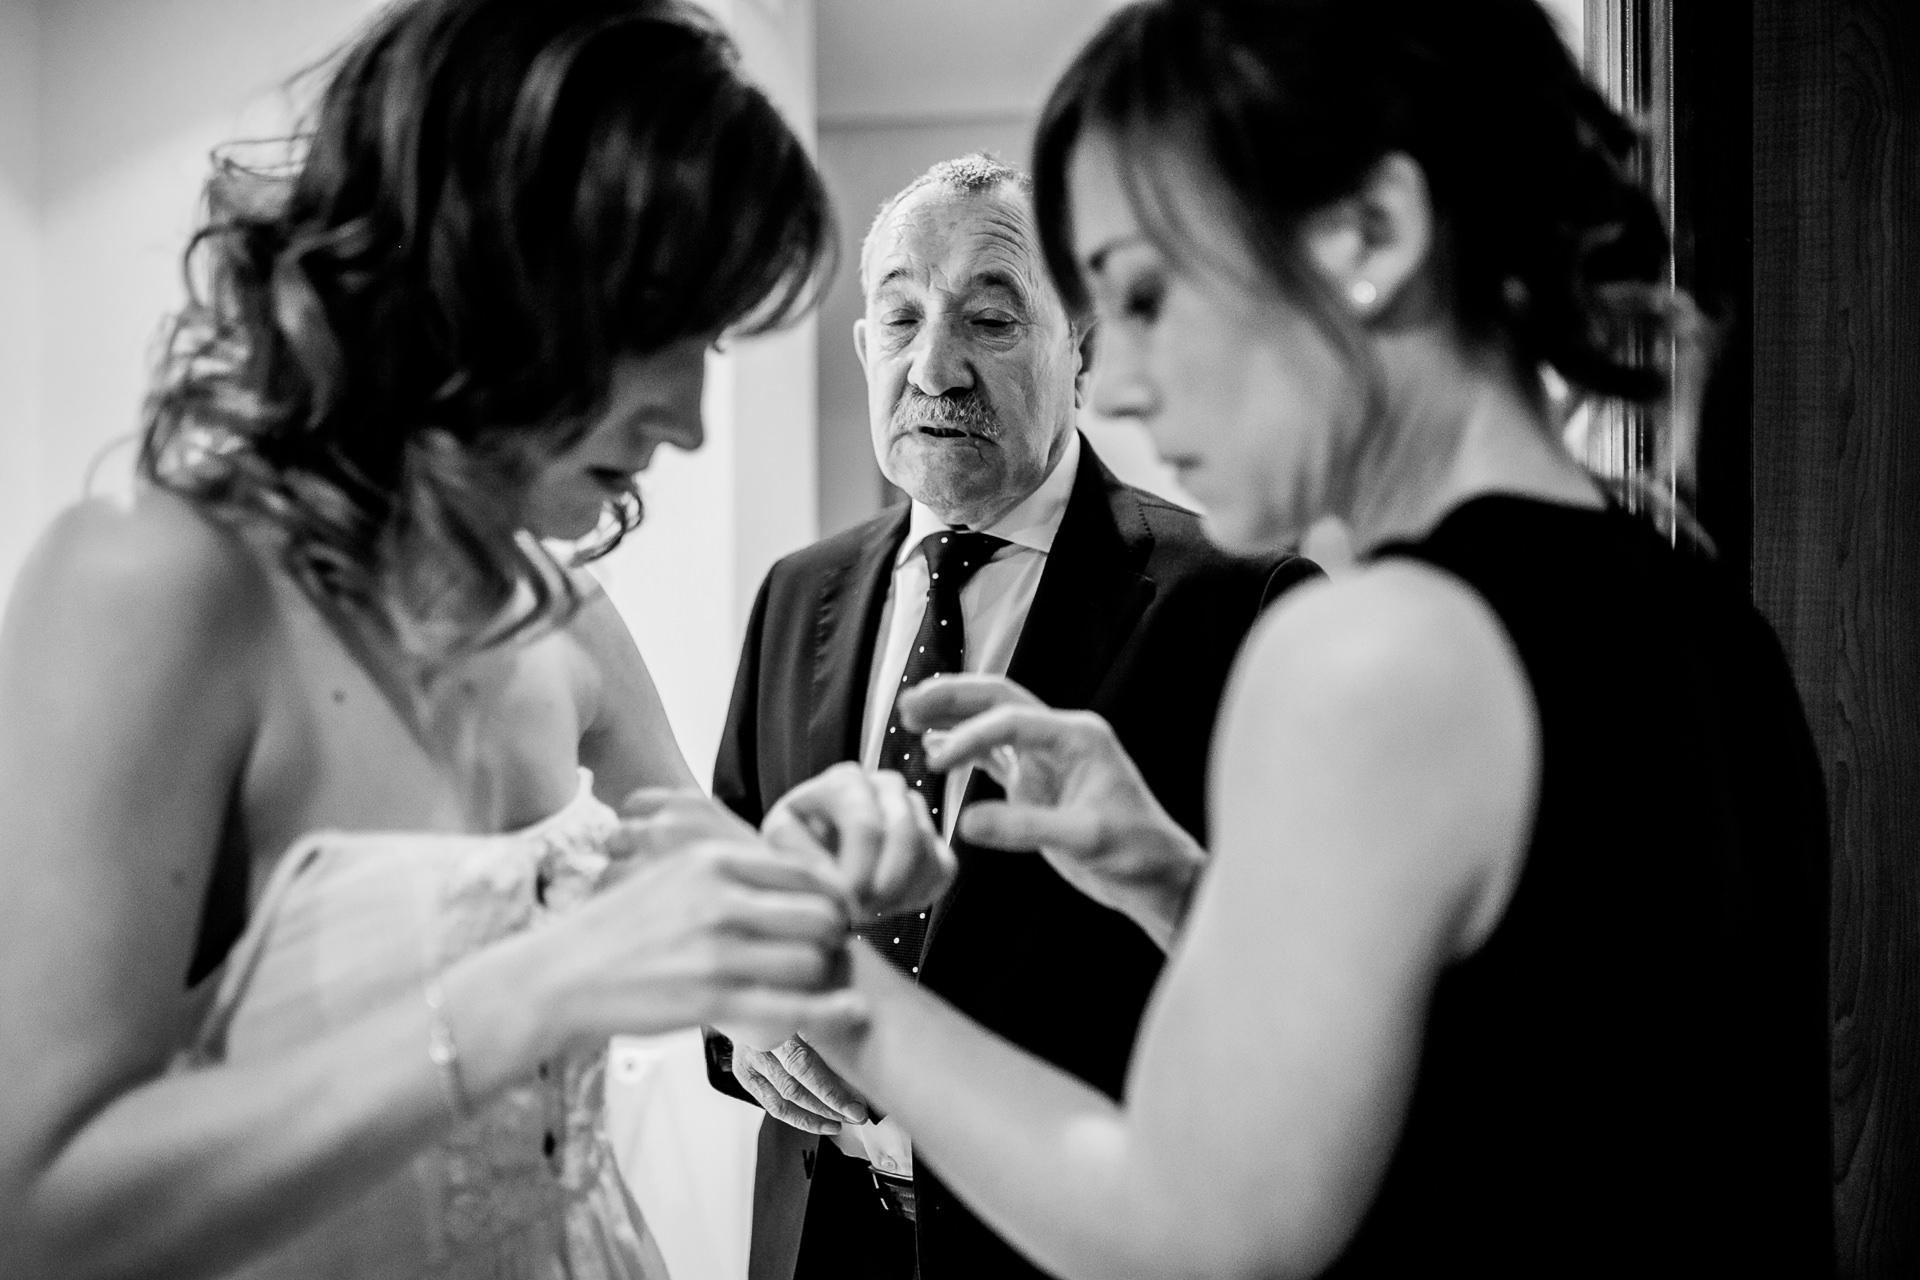 boda civil eguren ugarte la rioja 102805